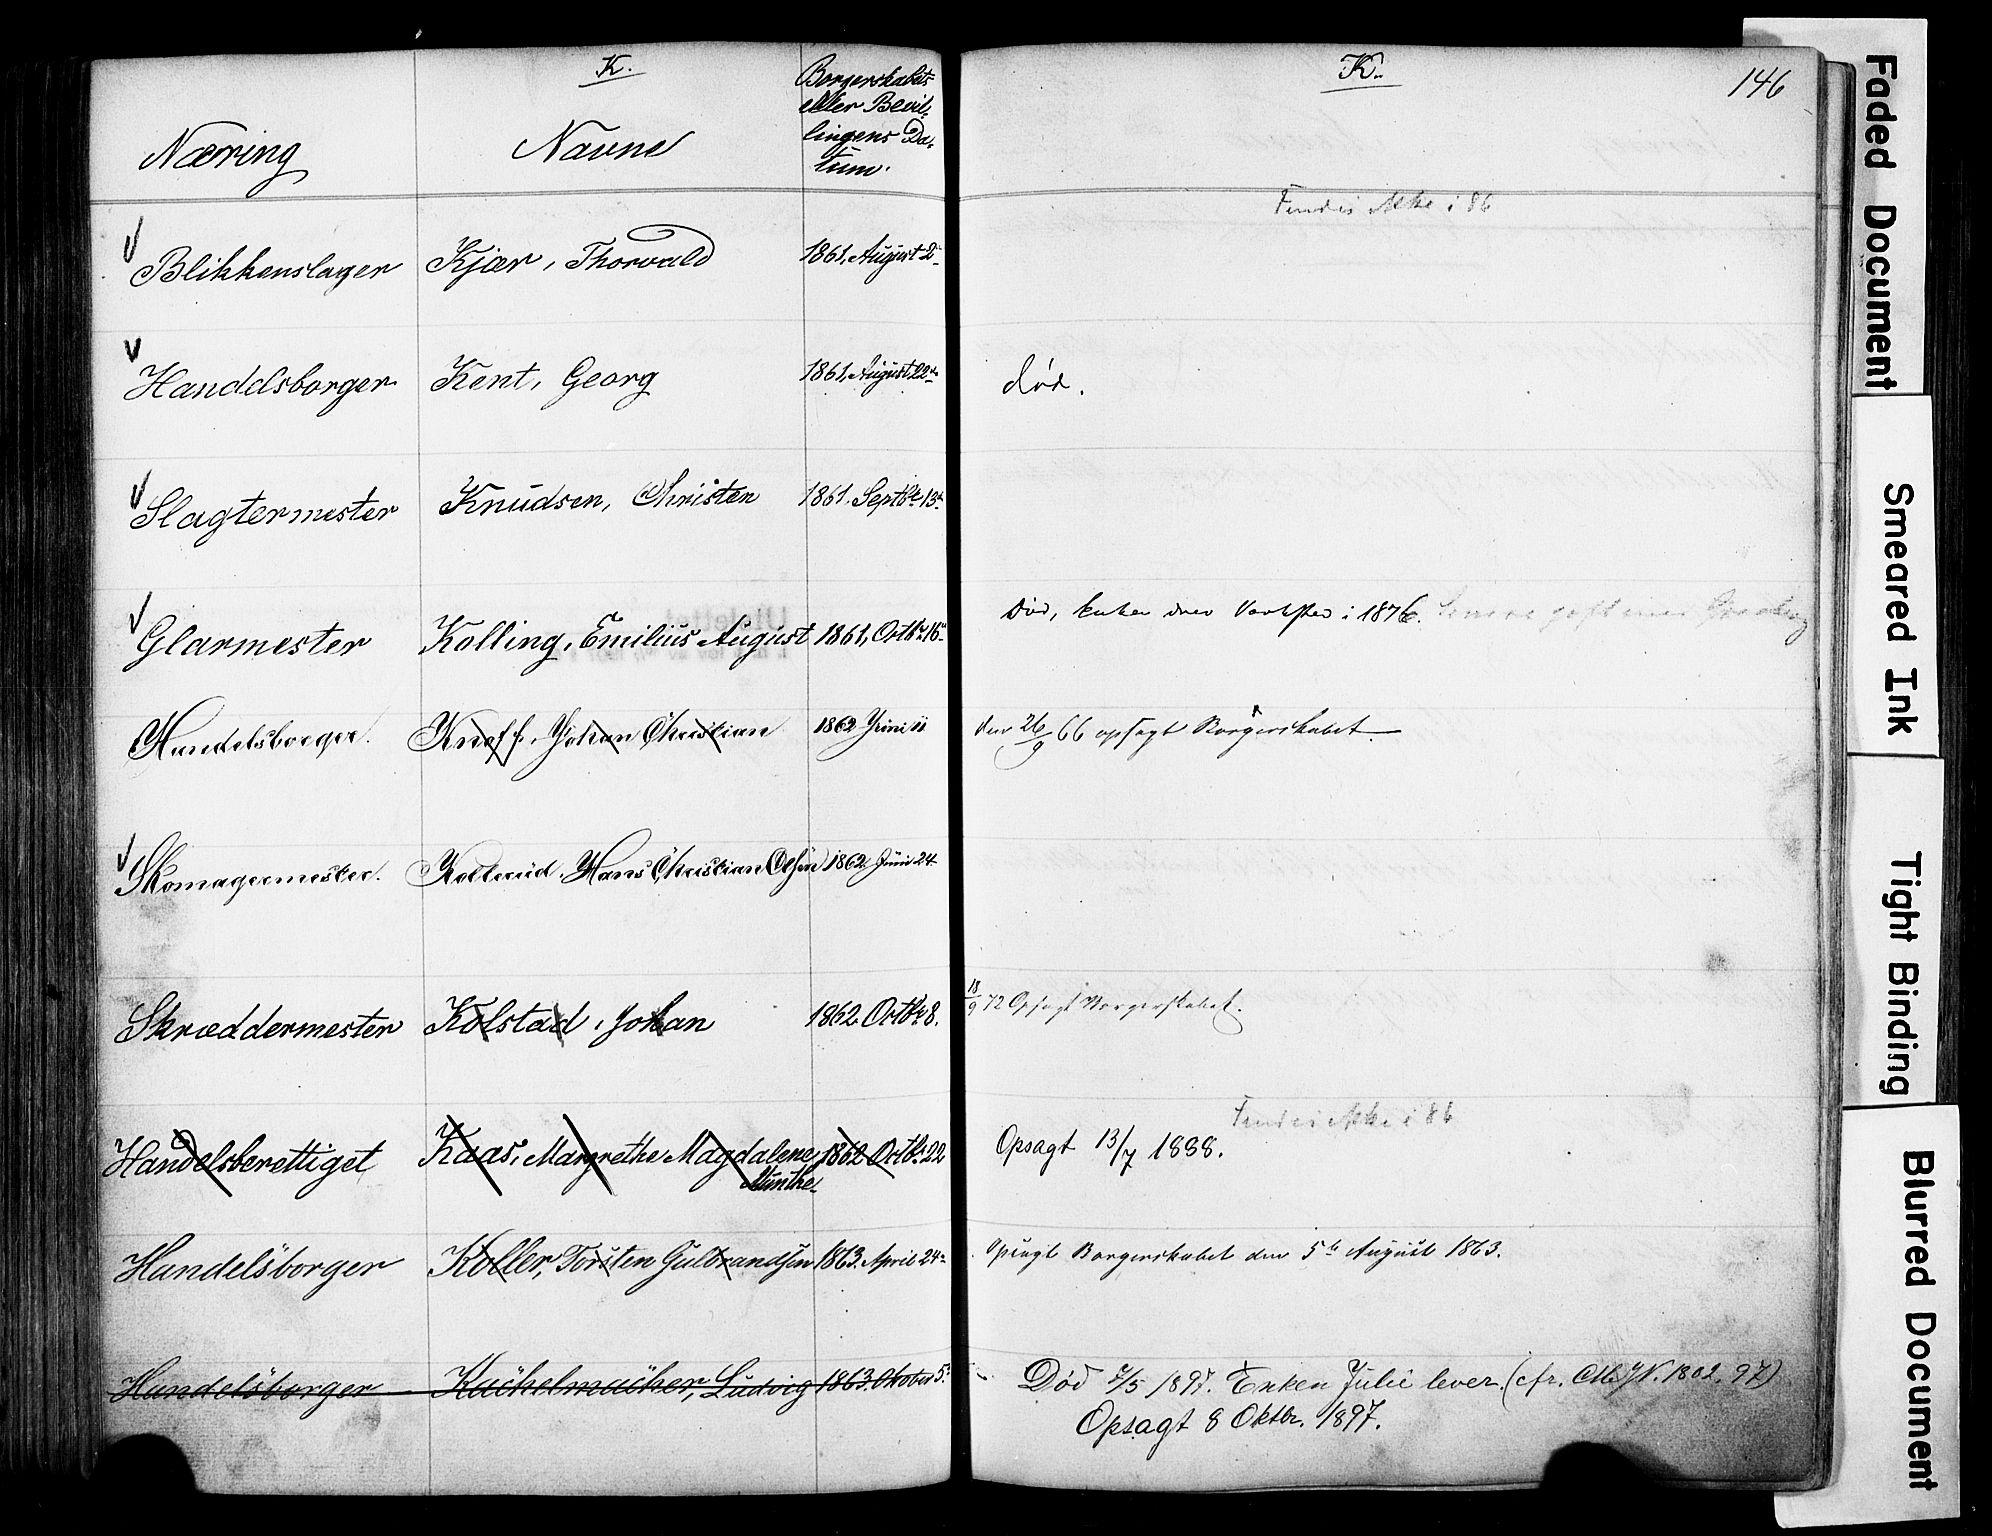 SAO, Kristiania magistrat, F/Fb/L0004: Borgerrulle, 1860-1879, s. 148